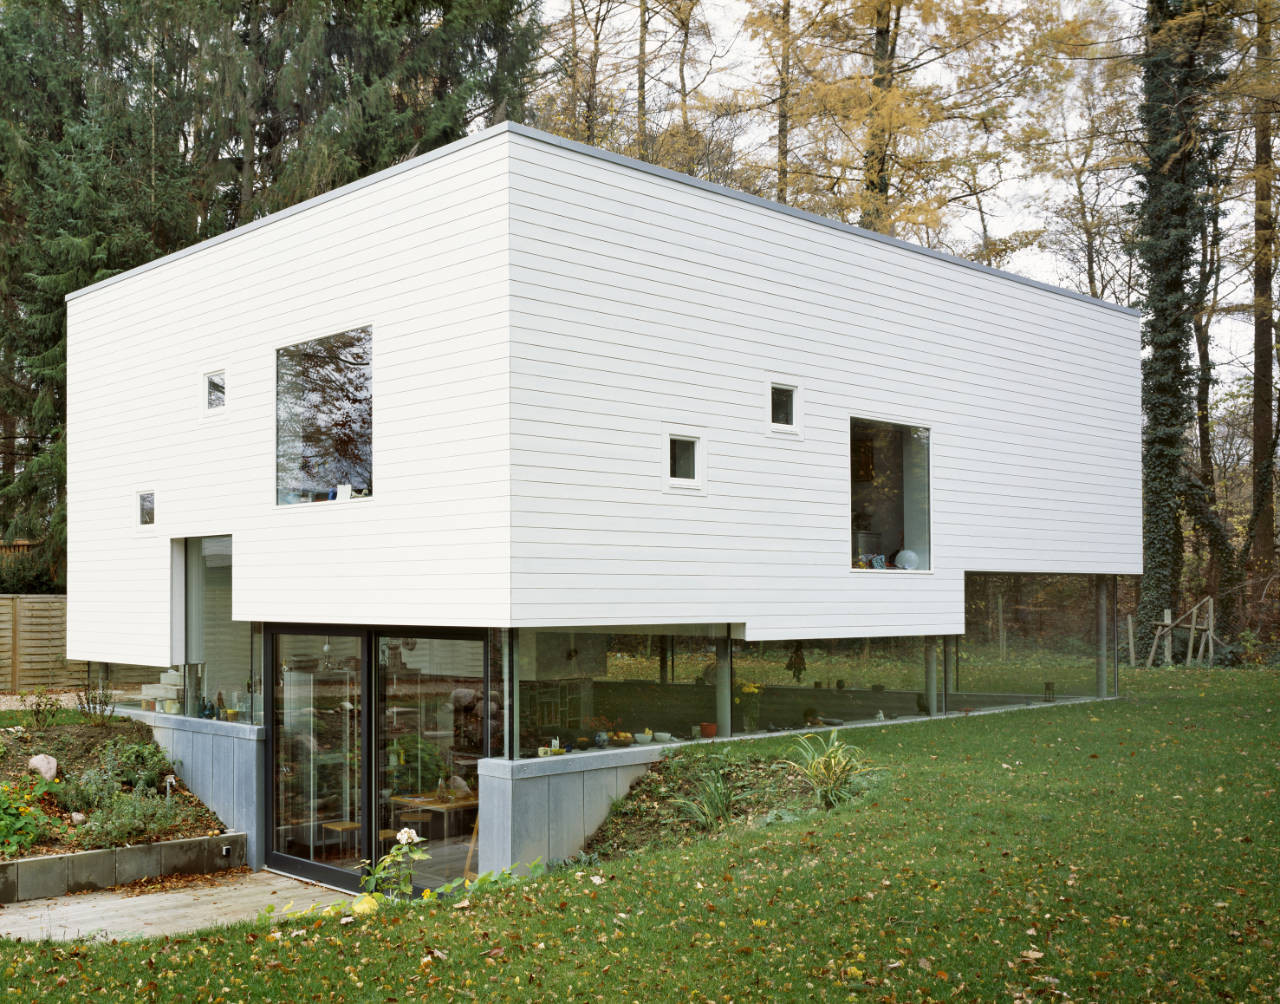 Creative Home Designs. creative renovation gives modern life to an ...